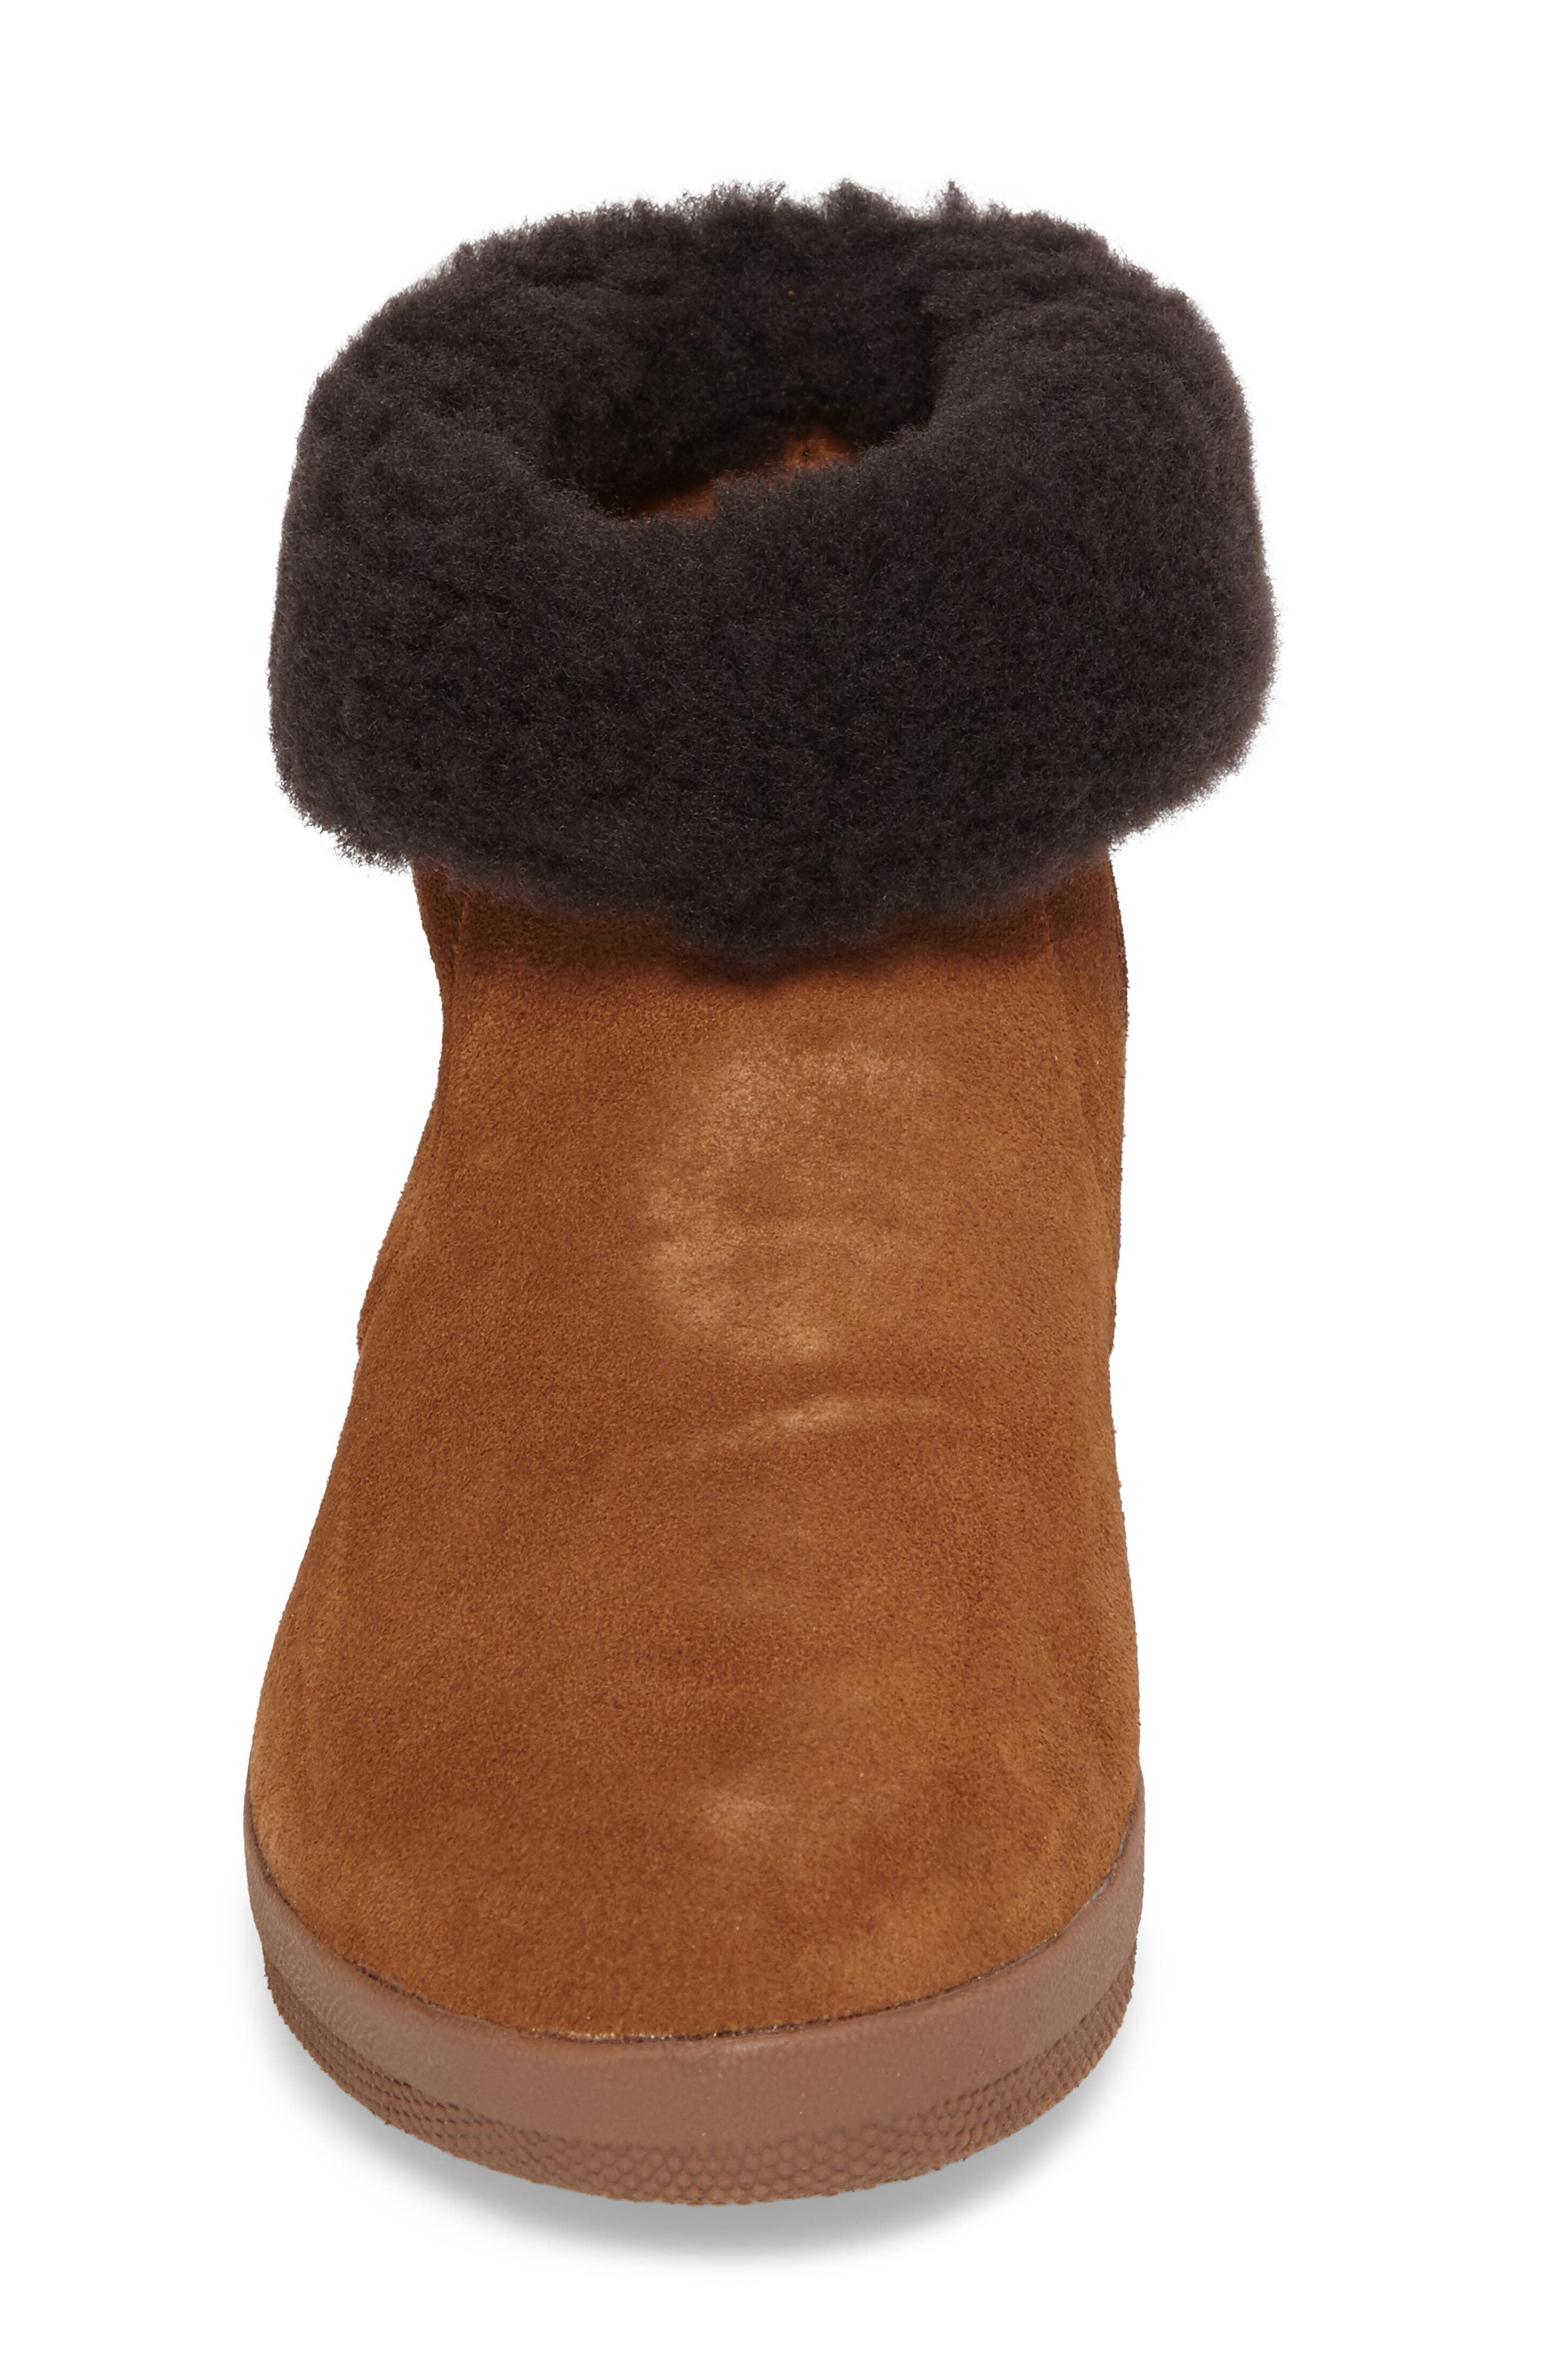 Skate Genuine Shearling Cuff Boot,                             Alternate thumbnail 4, color,                             Chestnut